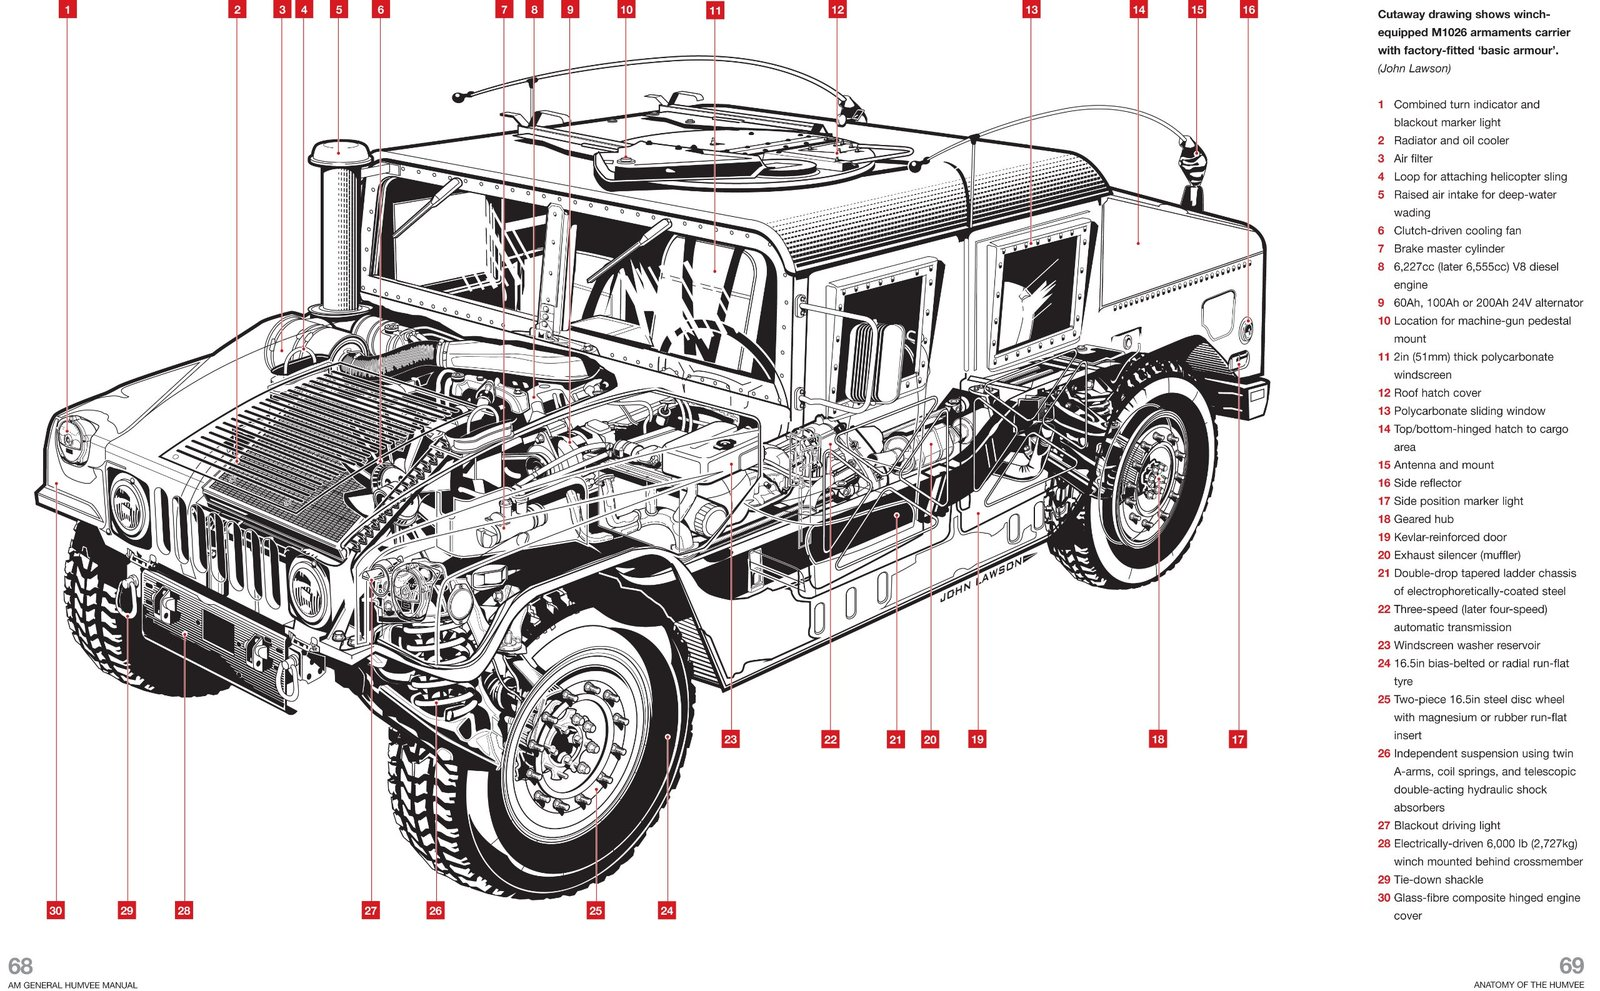 humvee enthusiasts manual pat ware book in stock buy now at rh mightyape co nz M1165 Technical Manual humvee repair manual